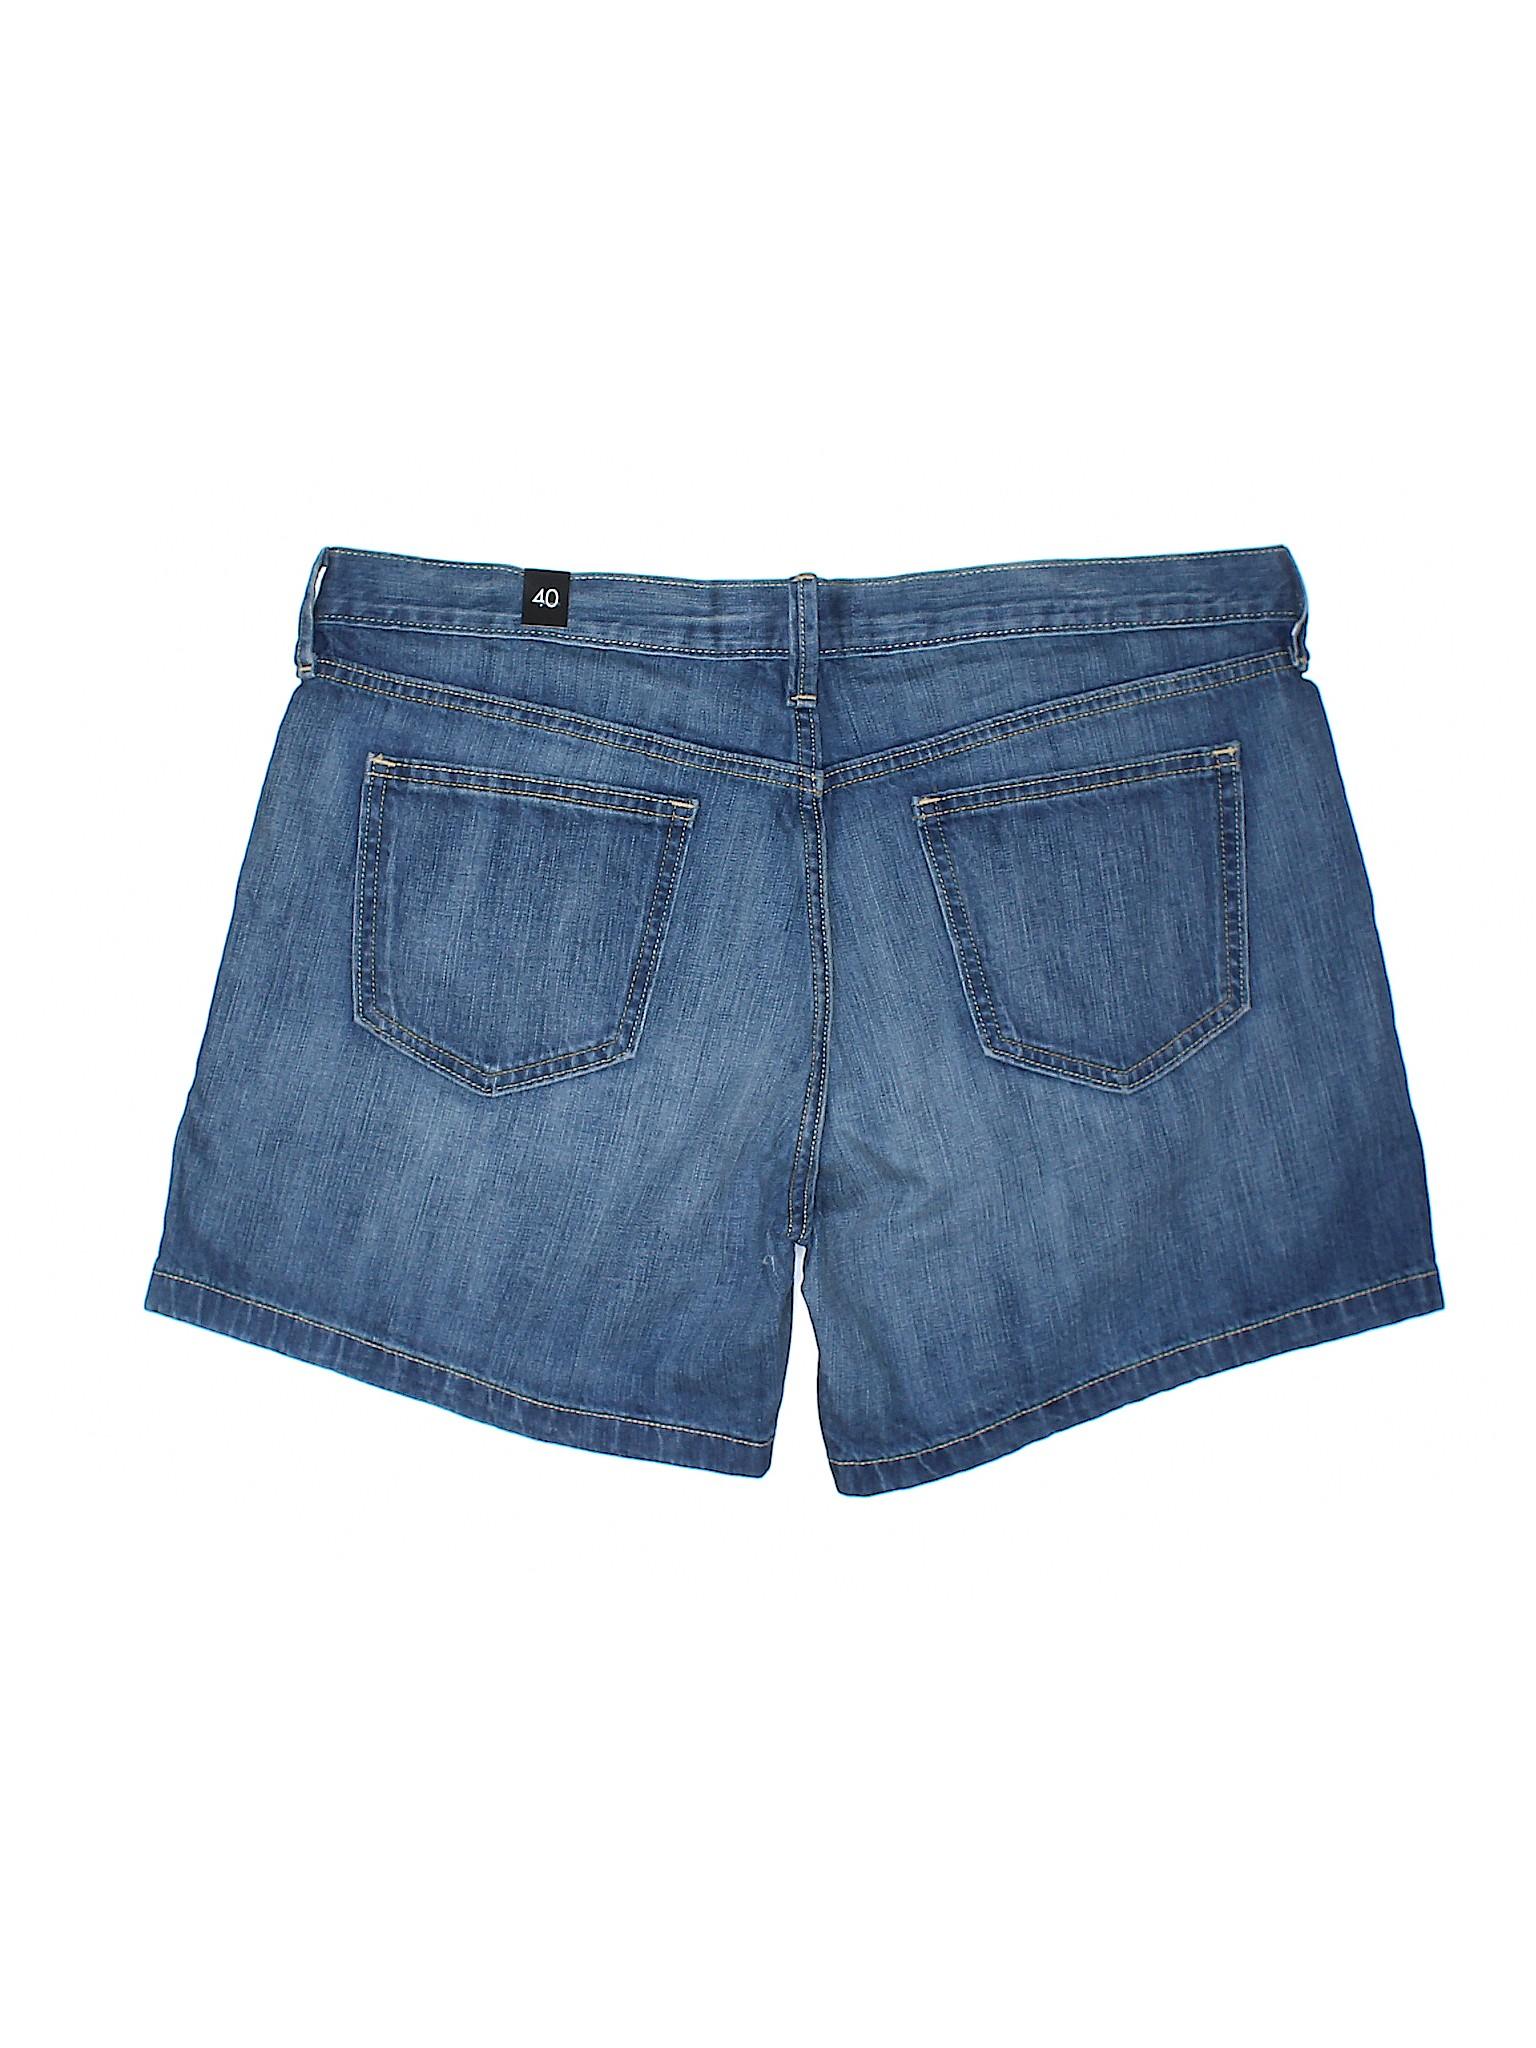 Boutique amp; Shorts George Denim Martha qxSw4zH8q